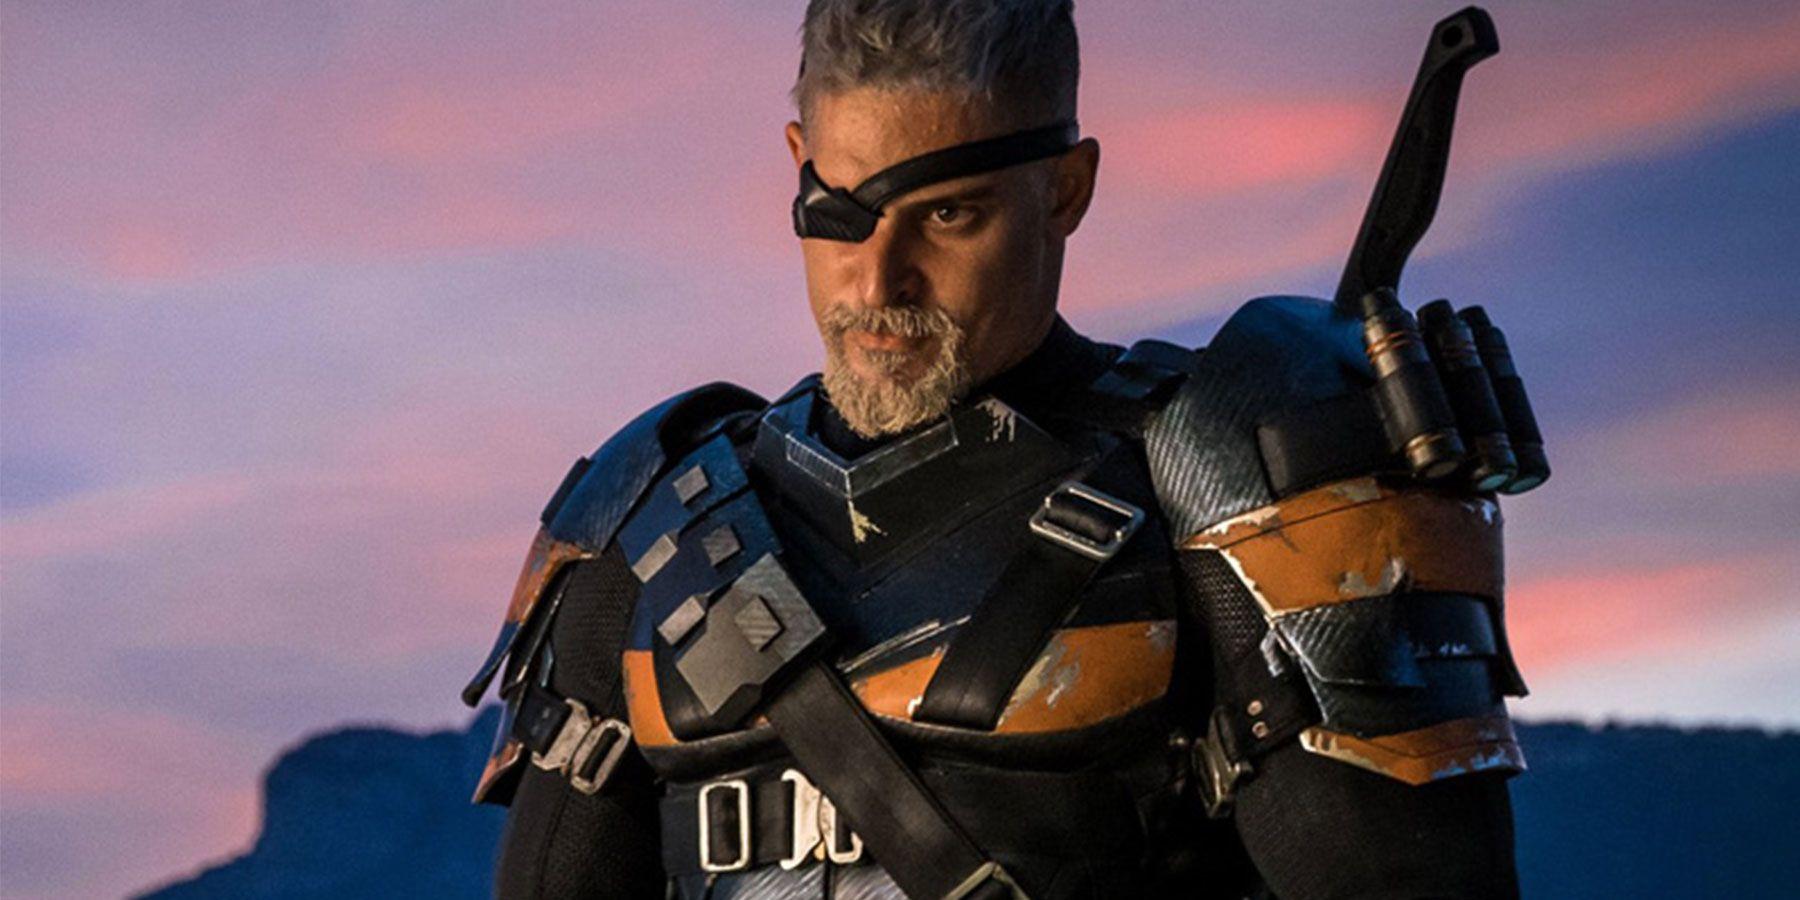 Justice League: Joe Manganiello Posts Deathstroke Snyder Cut Images